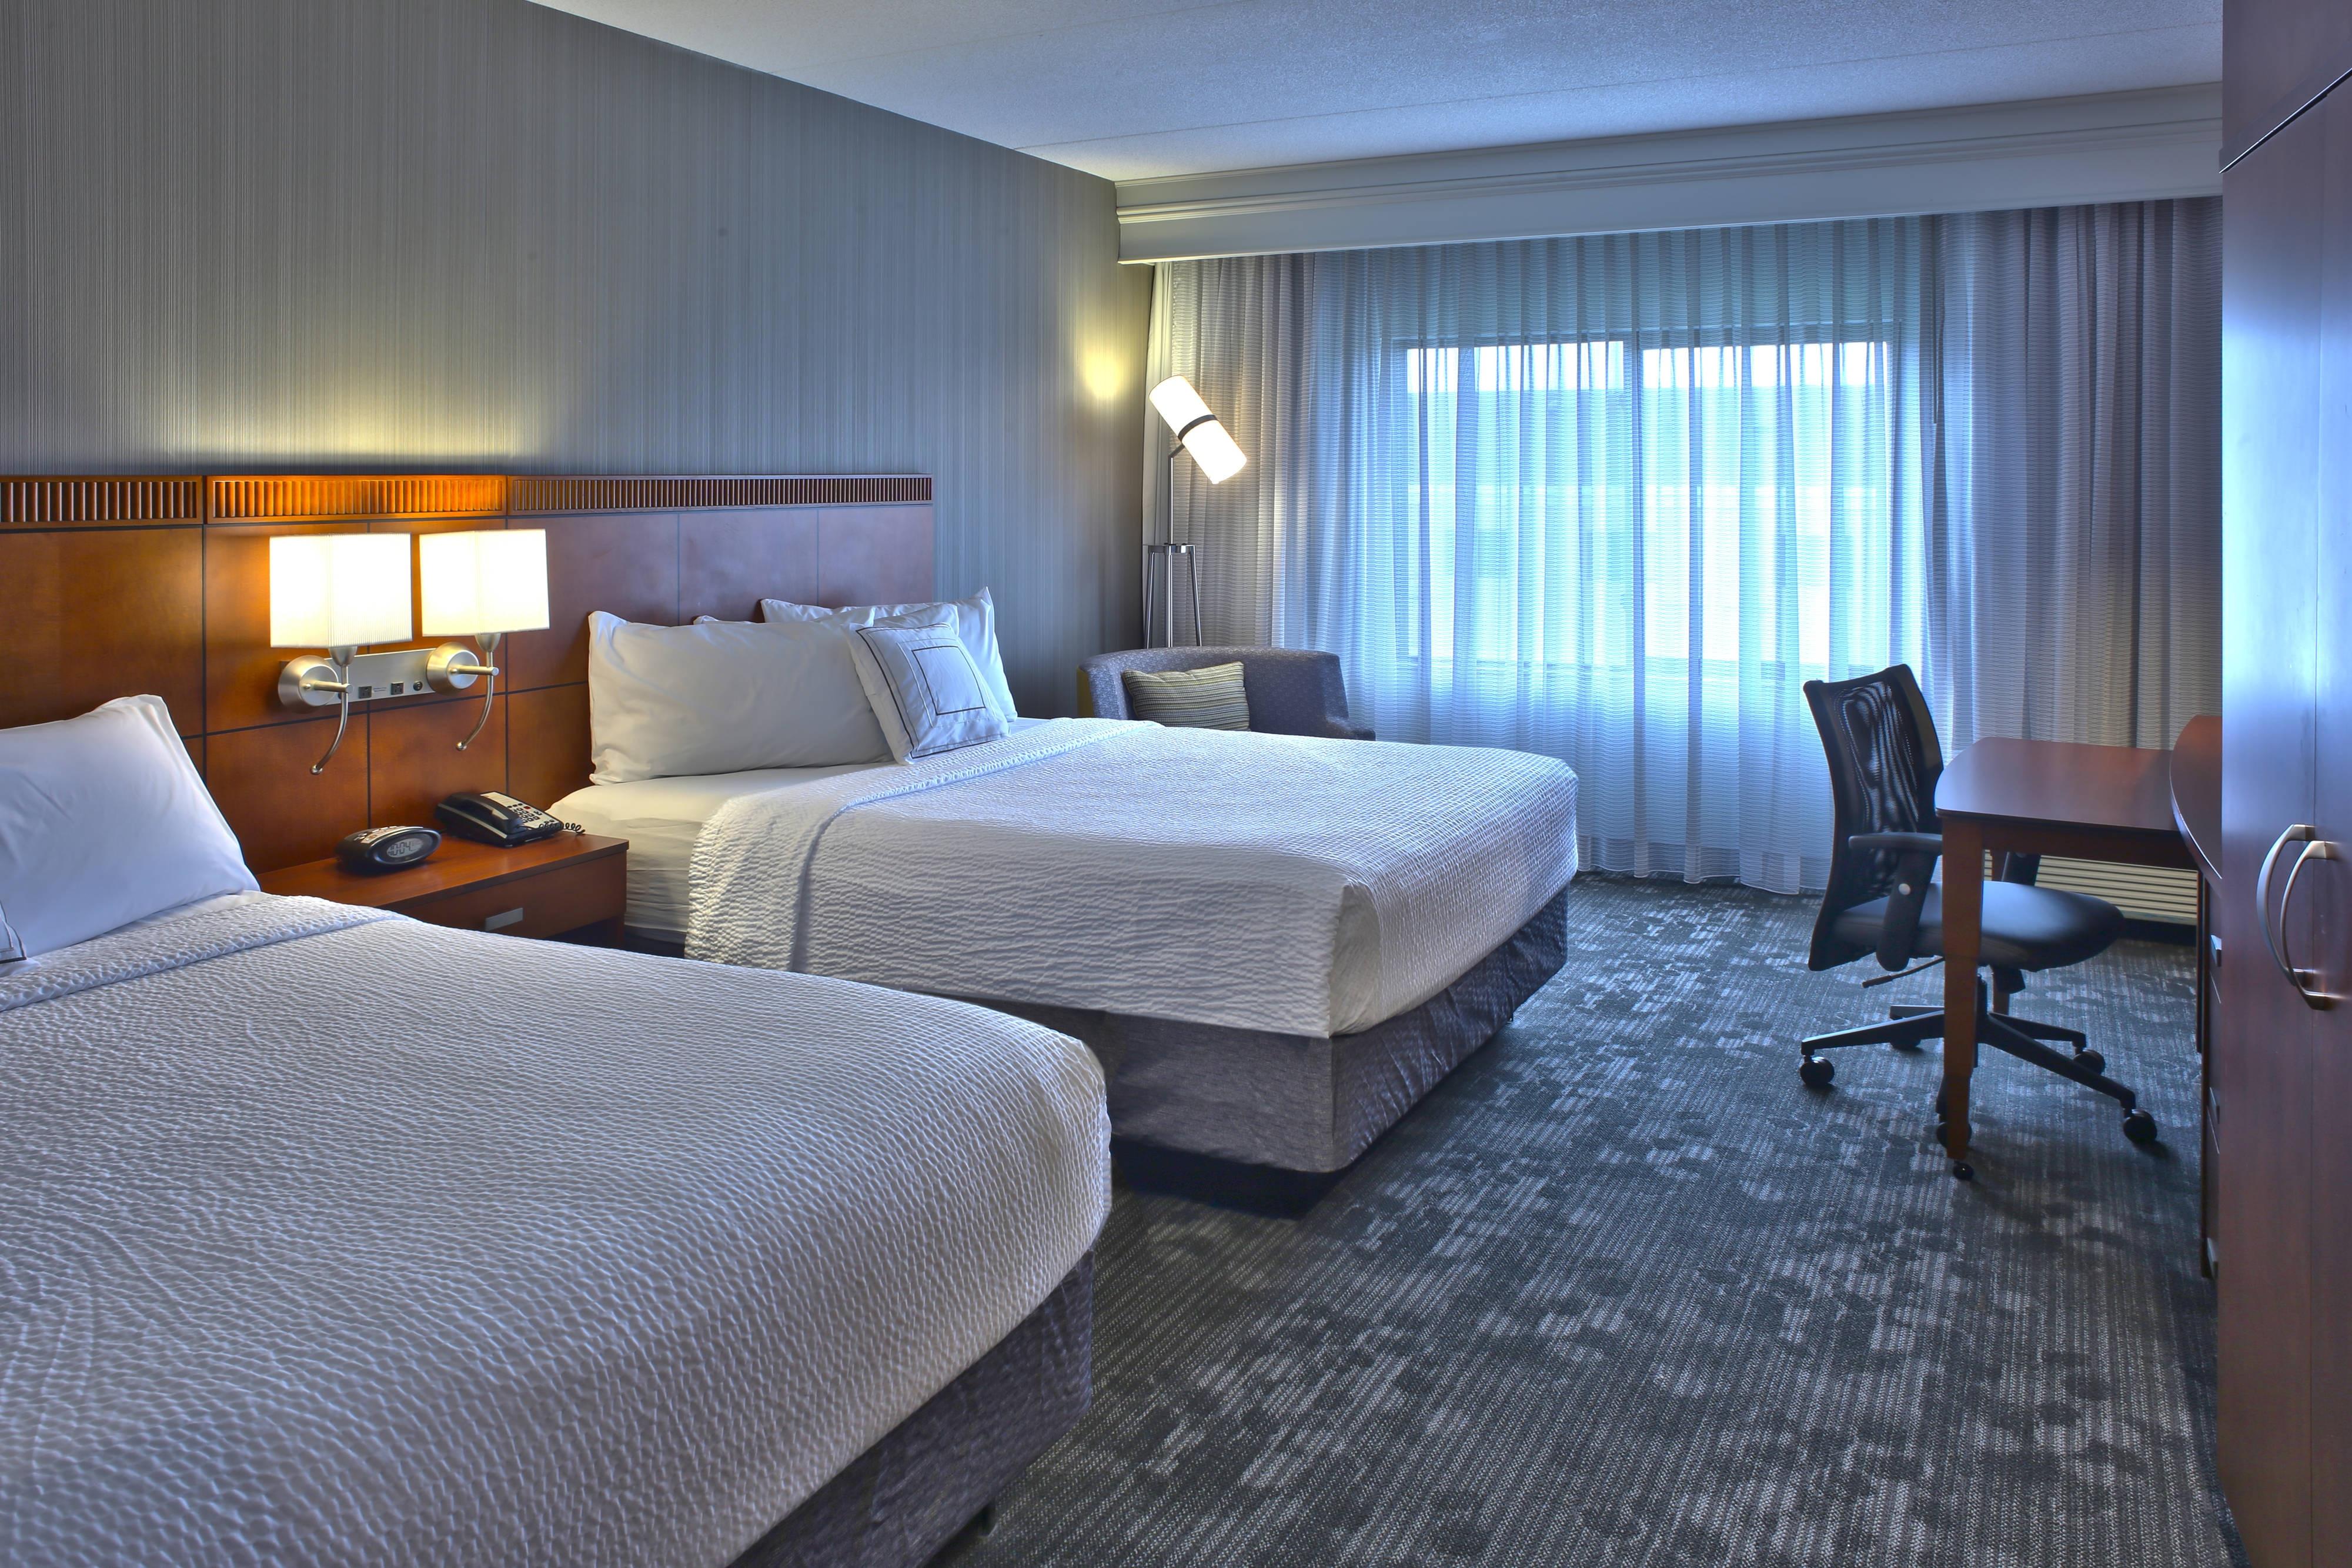 sofas hamilton ontario cindy crawford home bellingham vanilla sofa hotel hotels